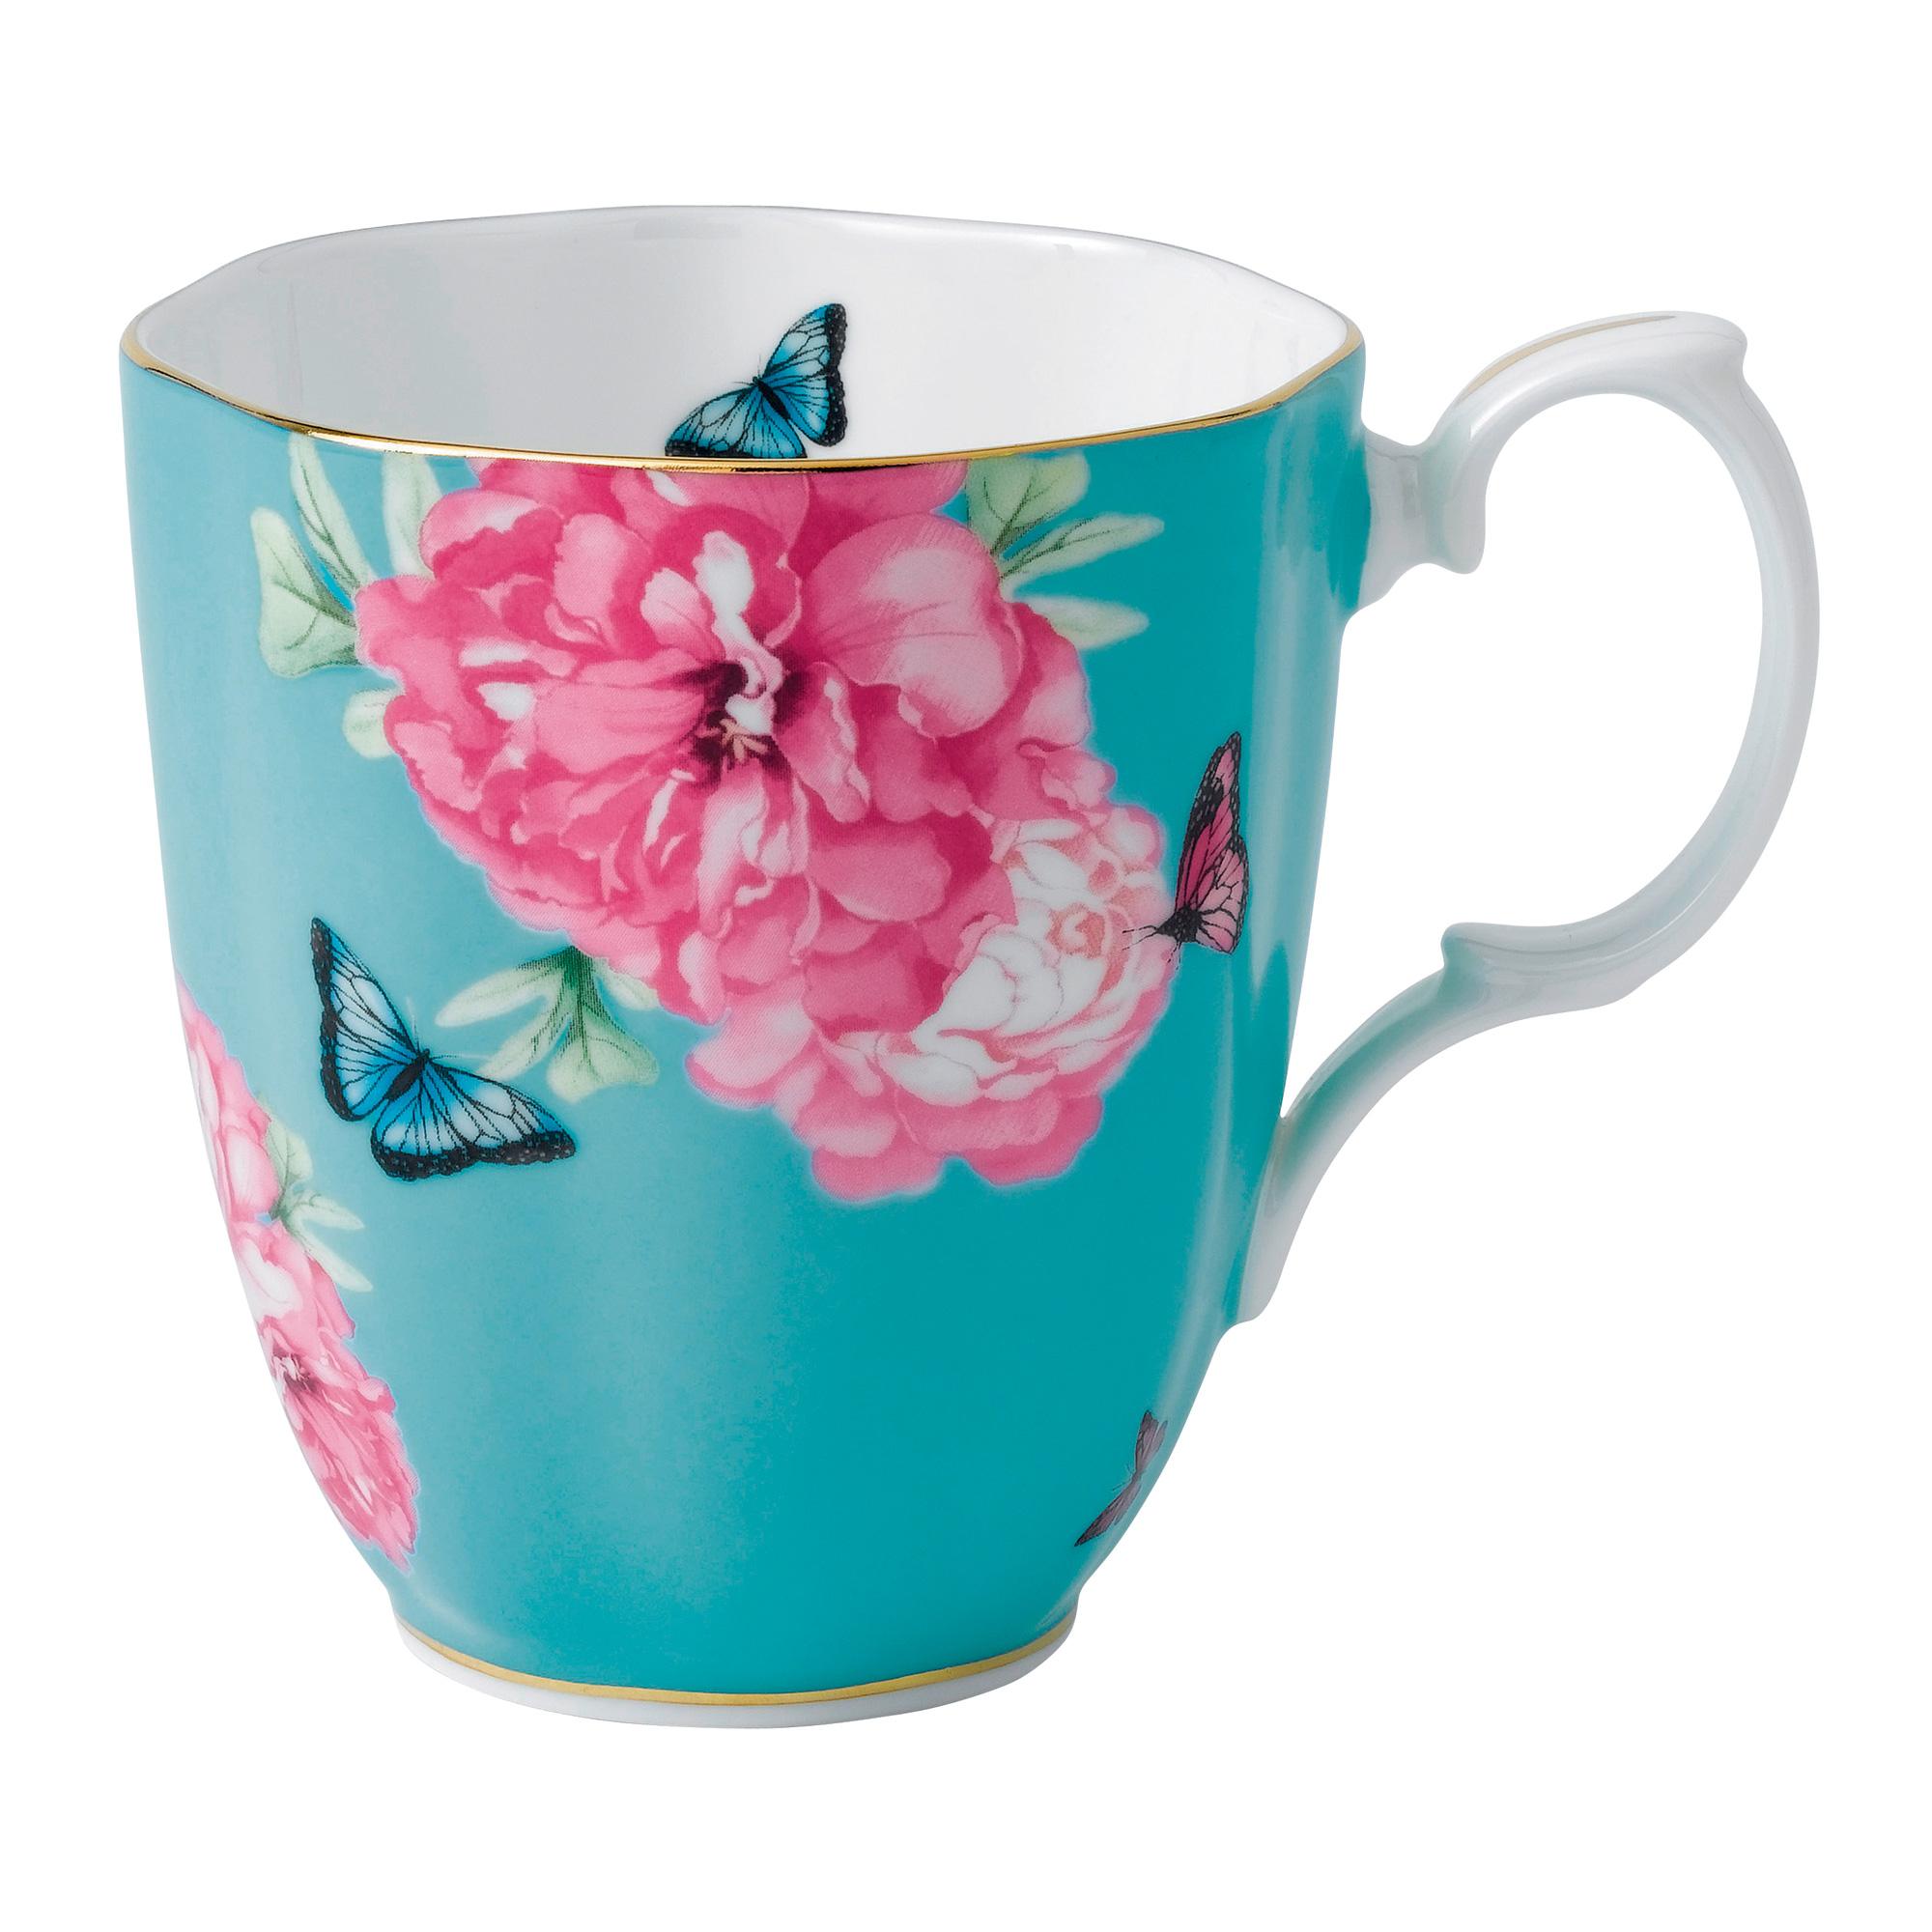 "Miranda Kerr for Royal Albert Collection - Vintage Mug (Turquoise) ""Friendship"" Pattern"